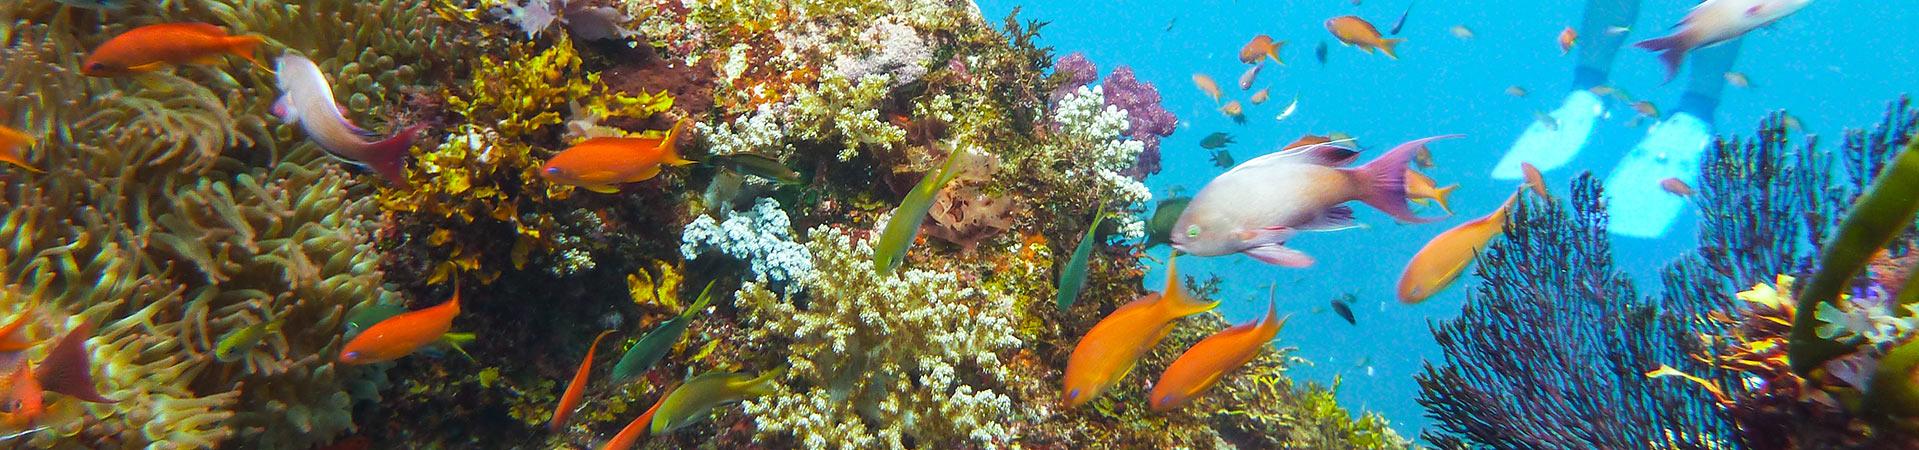 diving_slide02